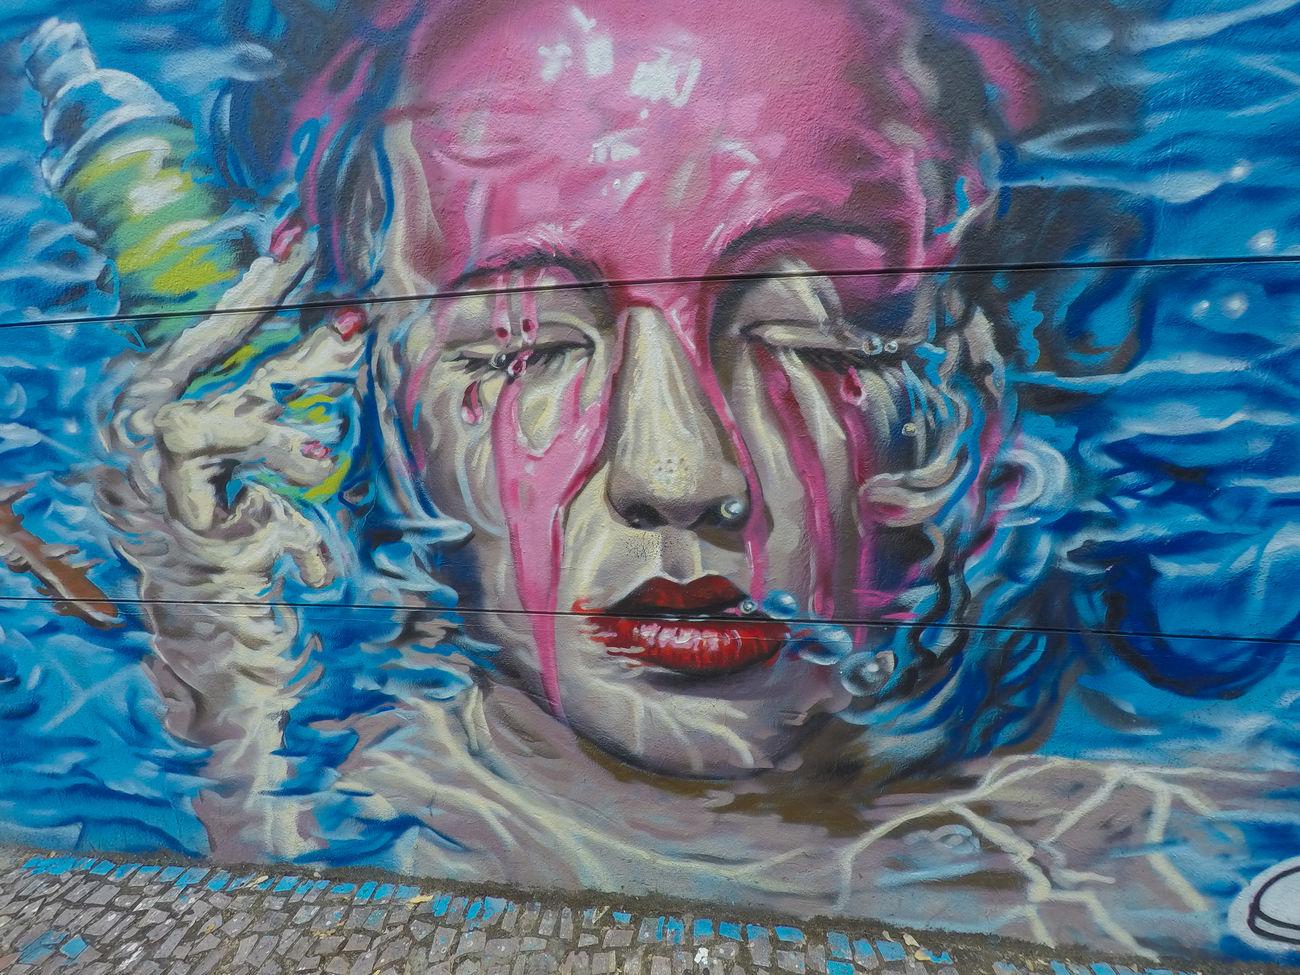 Grafite Arte De Rua ArtWork Cores Grafite Na Par Grafitti Wall Mur Muro  Pare Pinturasmurales Relaxing Sem Tempo